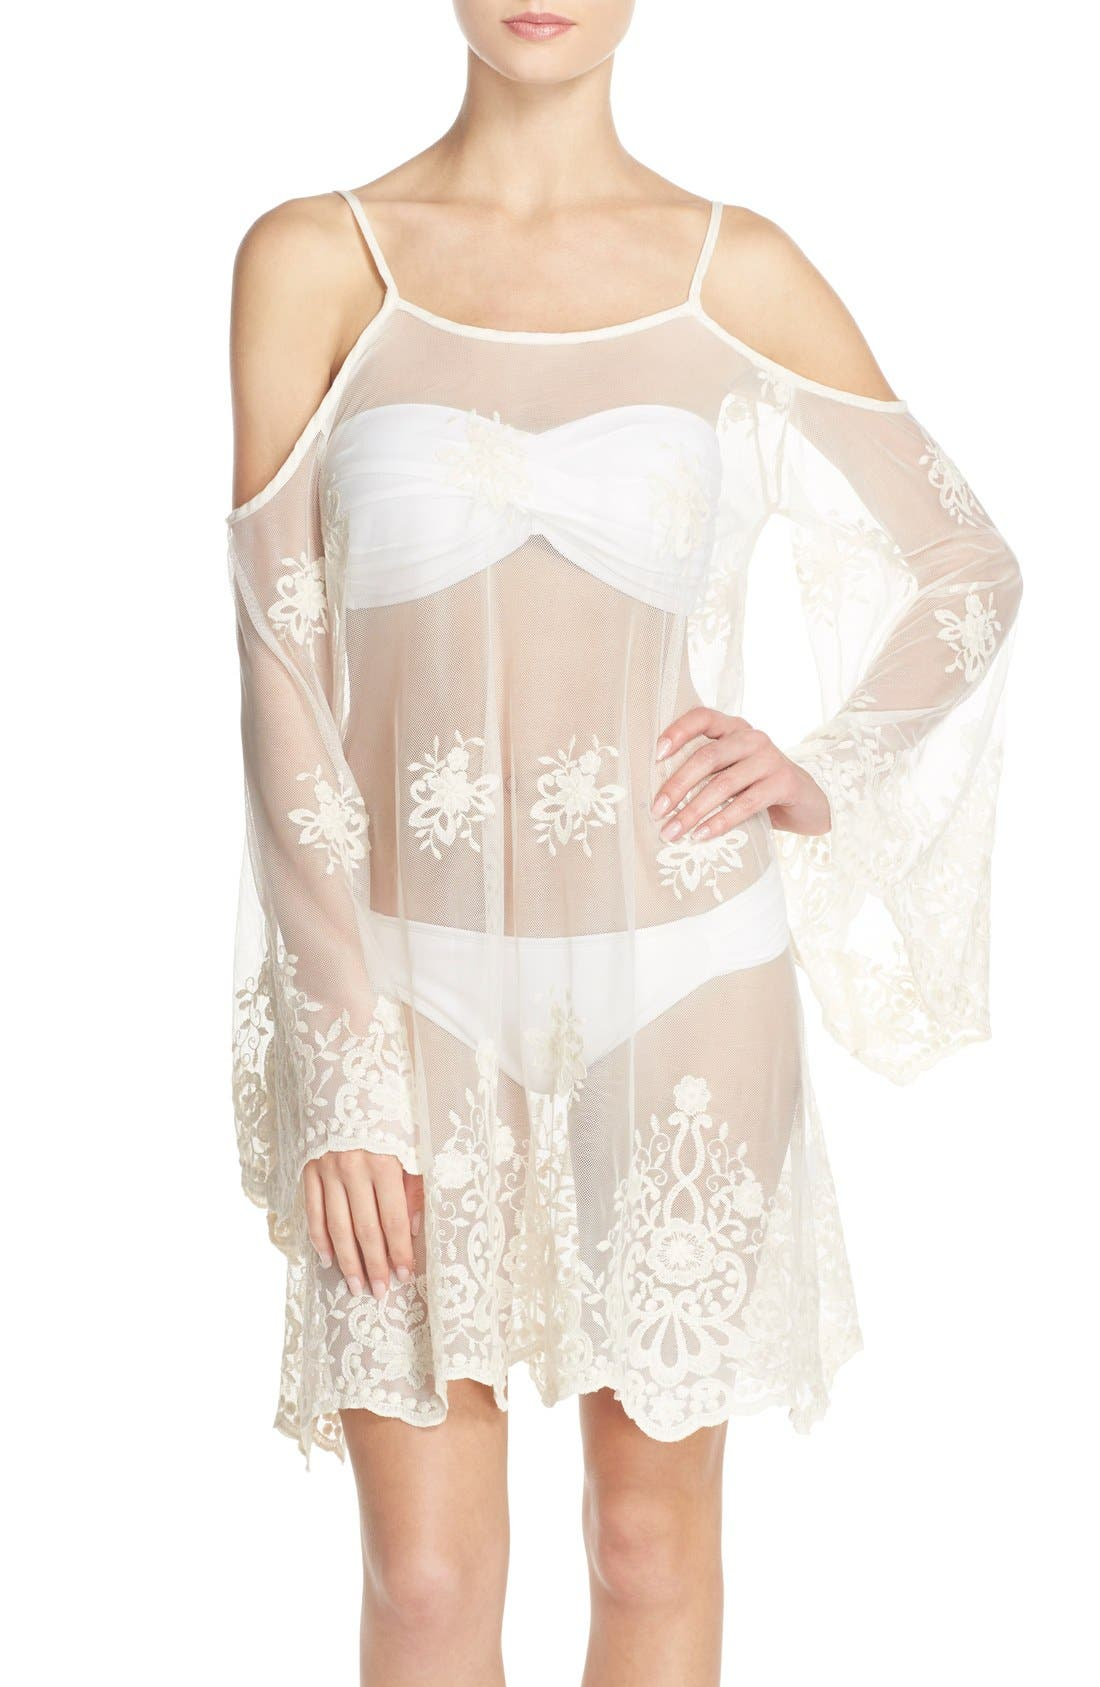 Main Image - Elan Lace Cover-Up Cold Shoulder Dress